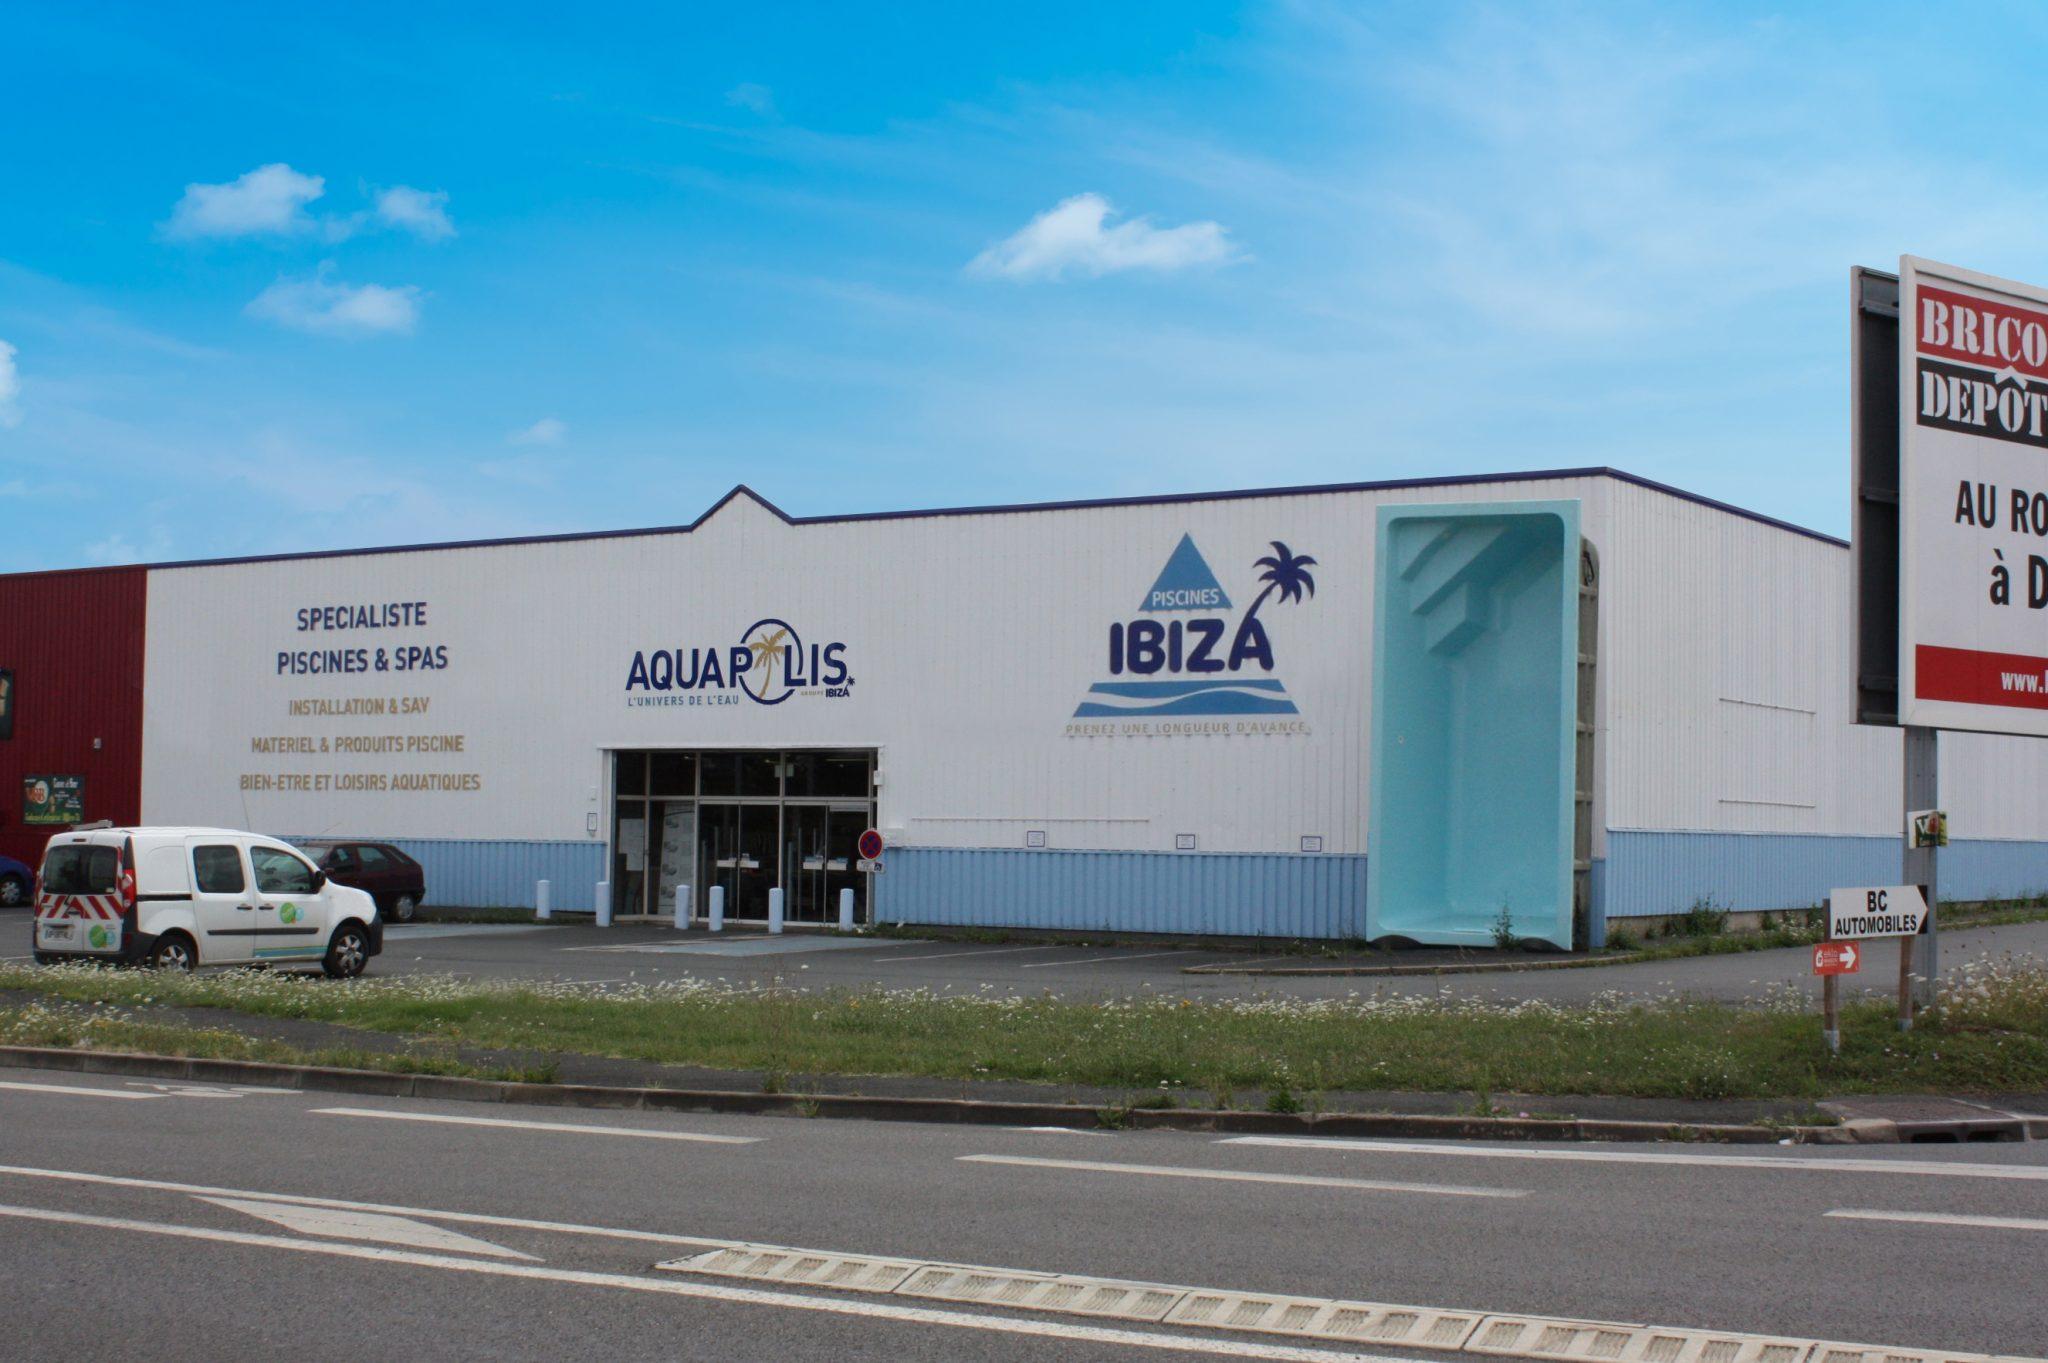 Pisciniste Chateauroux, Bourges - Piscines Ibiza dedans Margelles Piscine Brico Depot